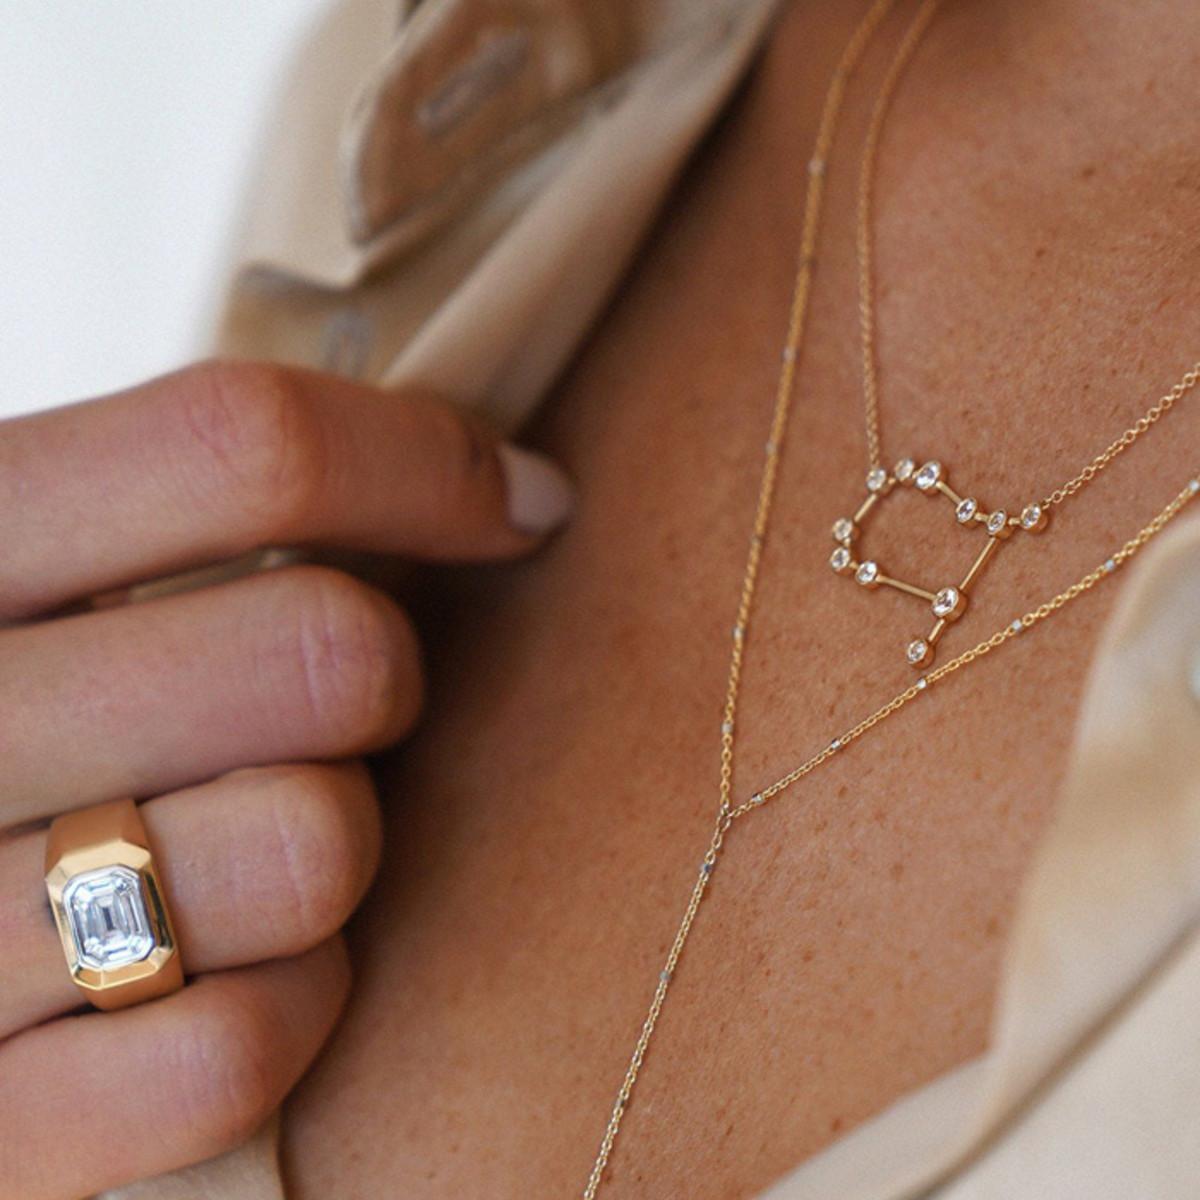 Logan Hollowell Gemini Constellation Necklace